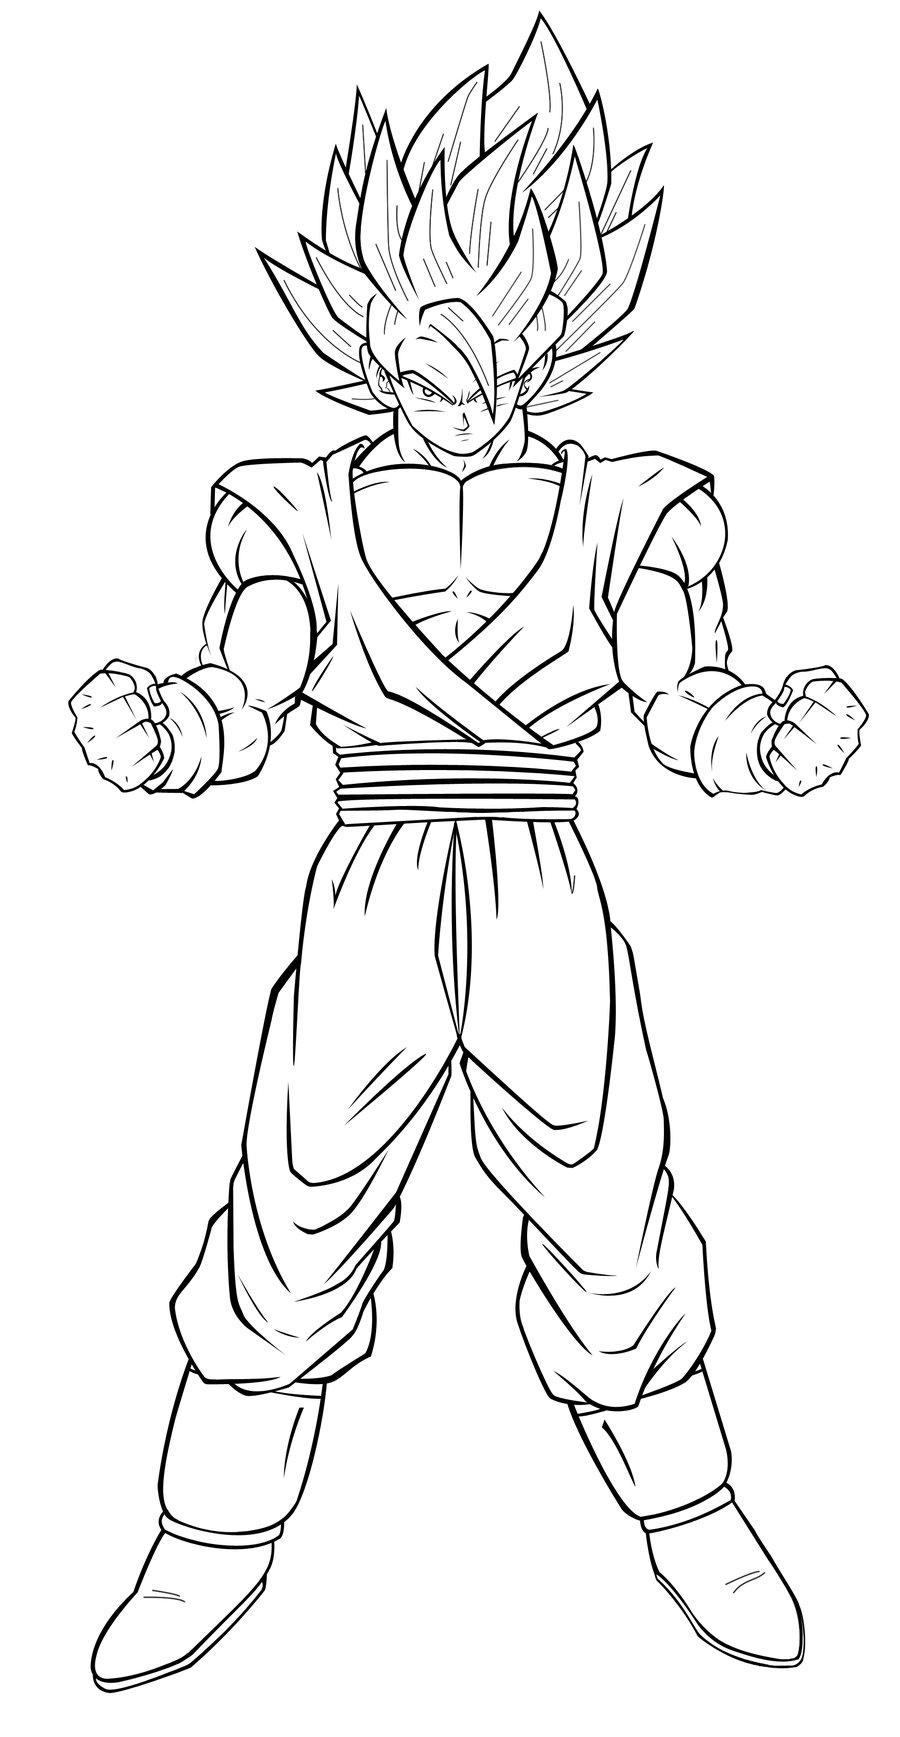 900x1737 Dragon Ball Z Coloring Pages Goku Super Saiyan From Goku Coloring